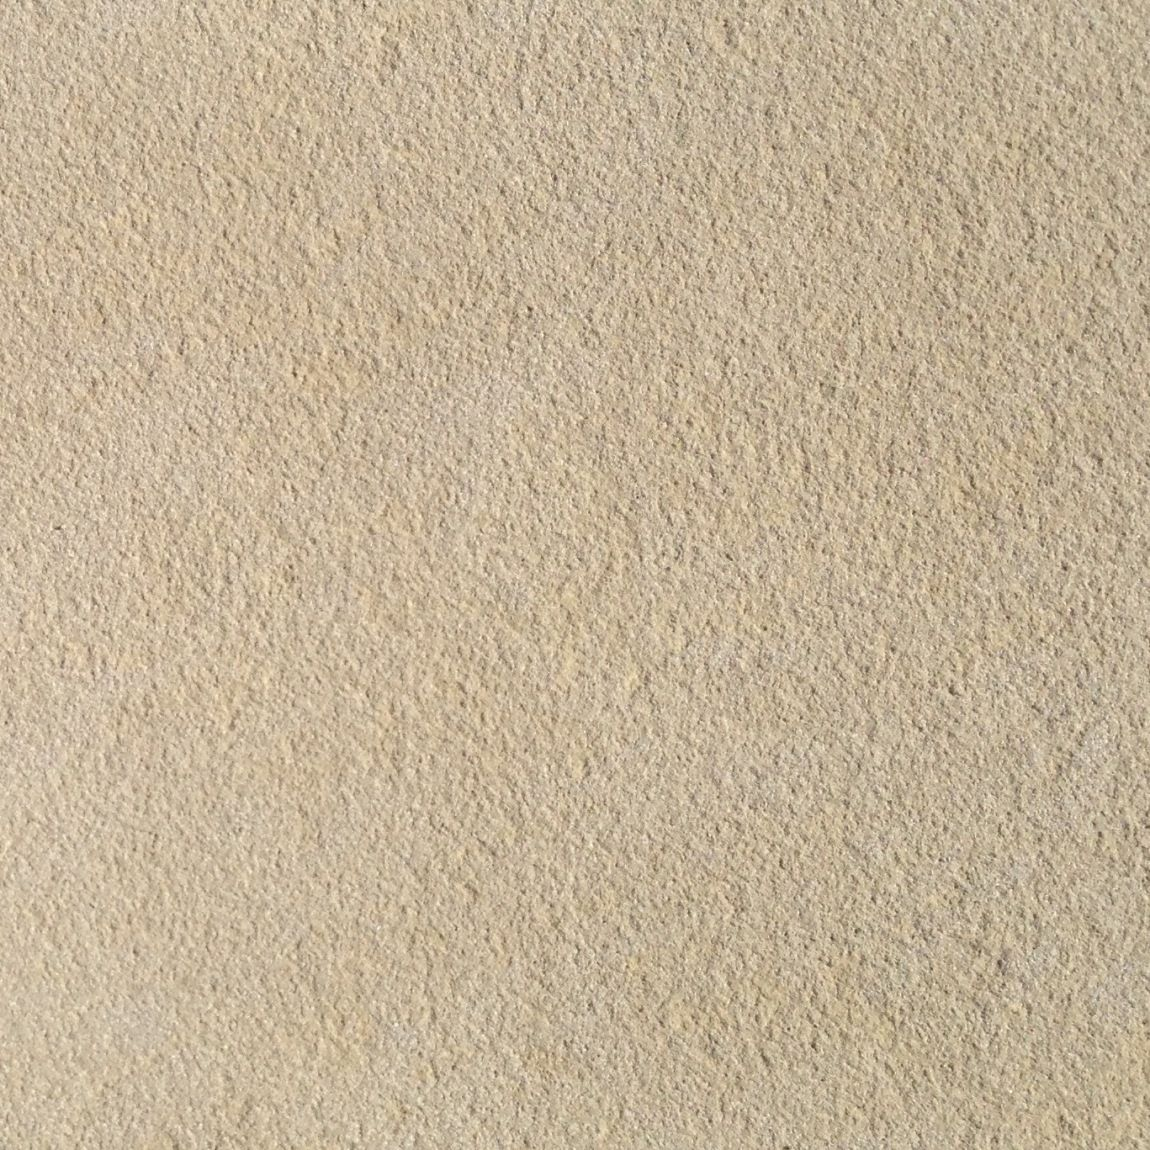 Image Result For Sandstone Texture Stones Plush Carpet